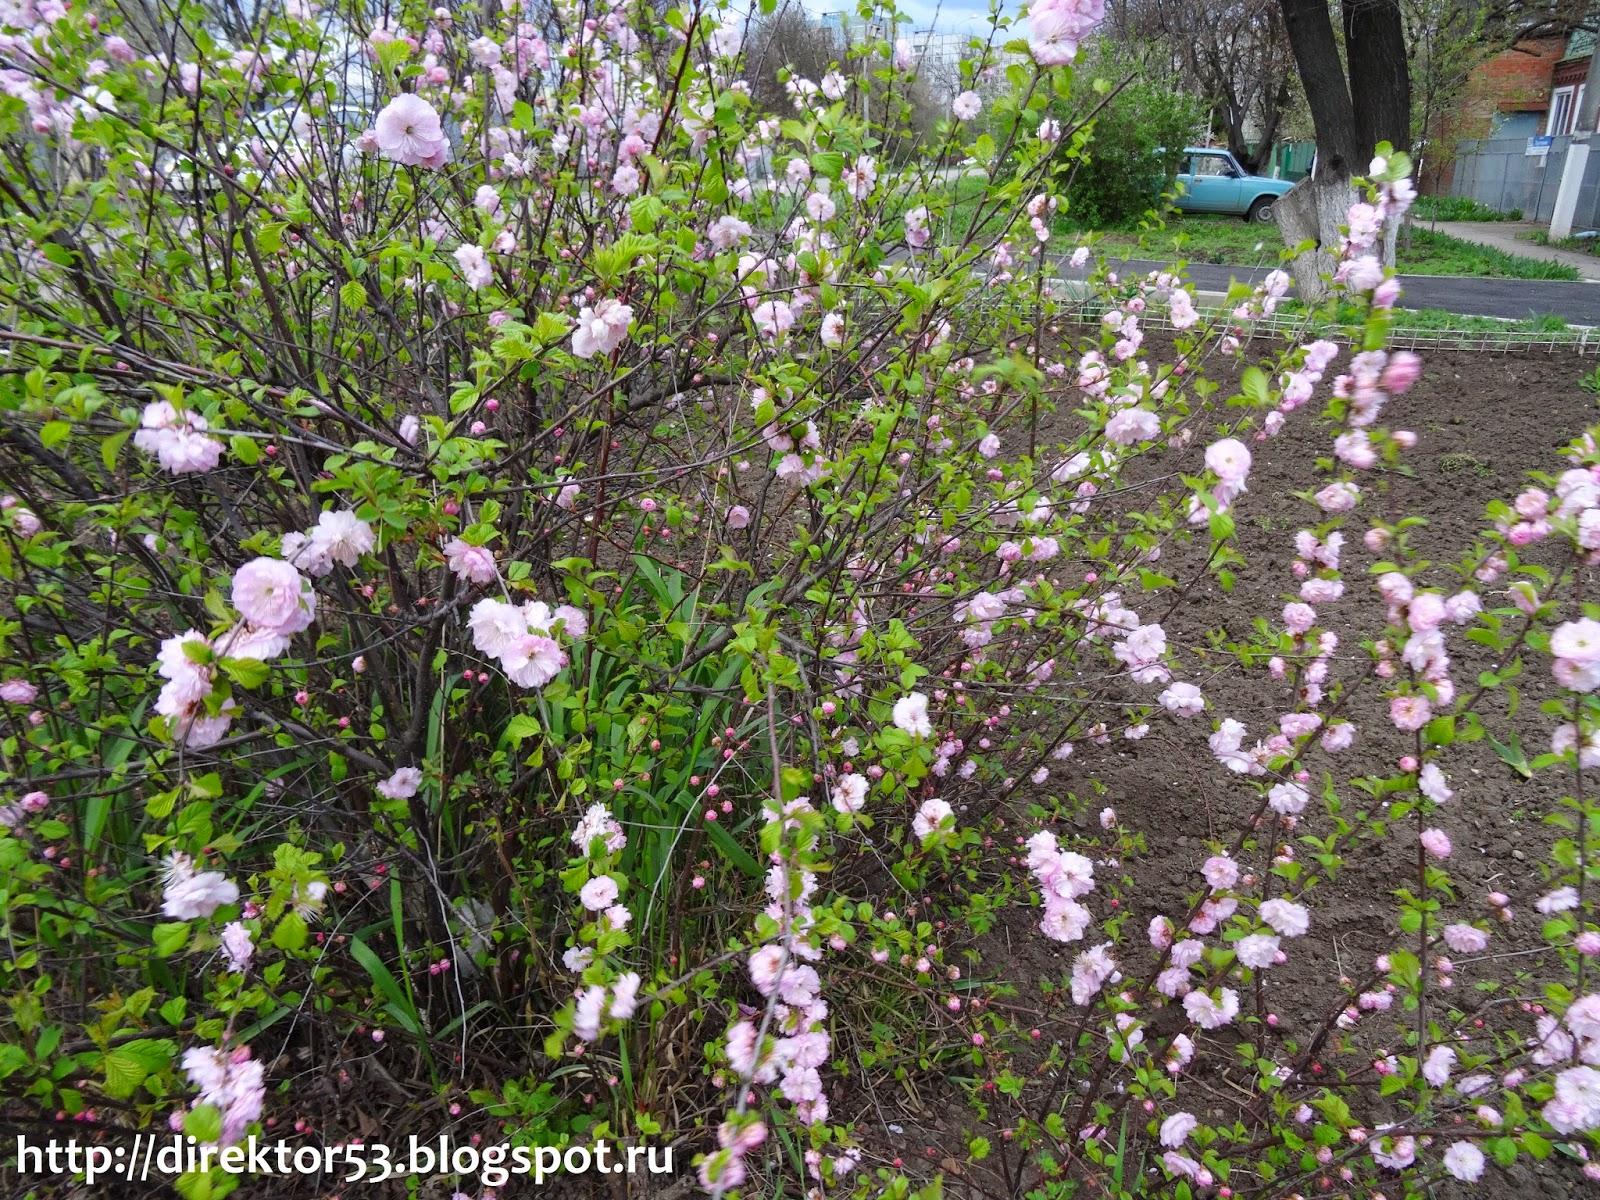 Фото кустарника с розовыми цветами